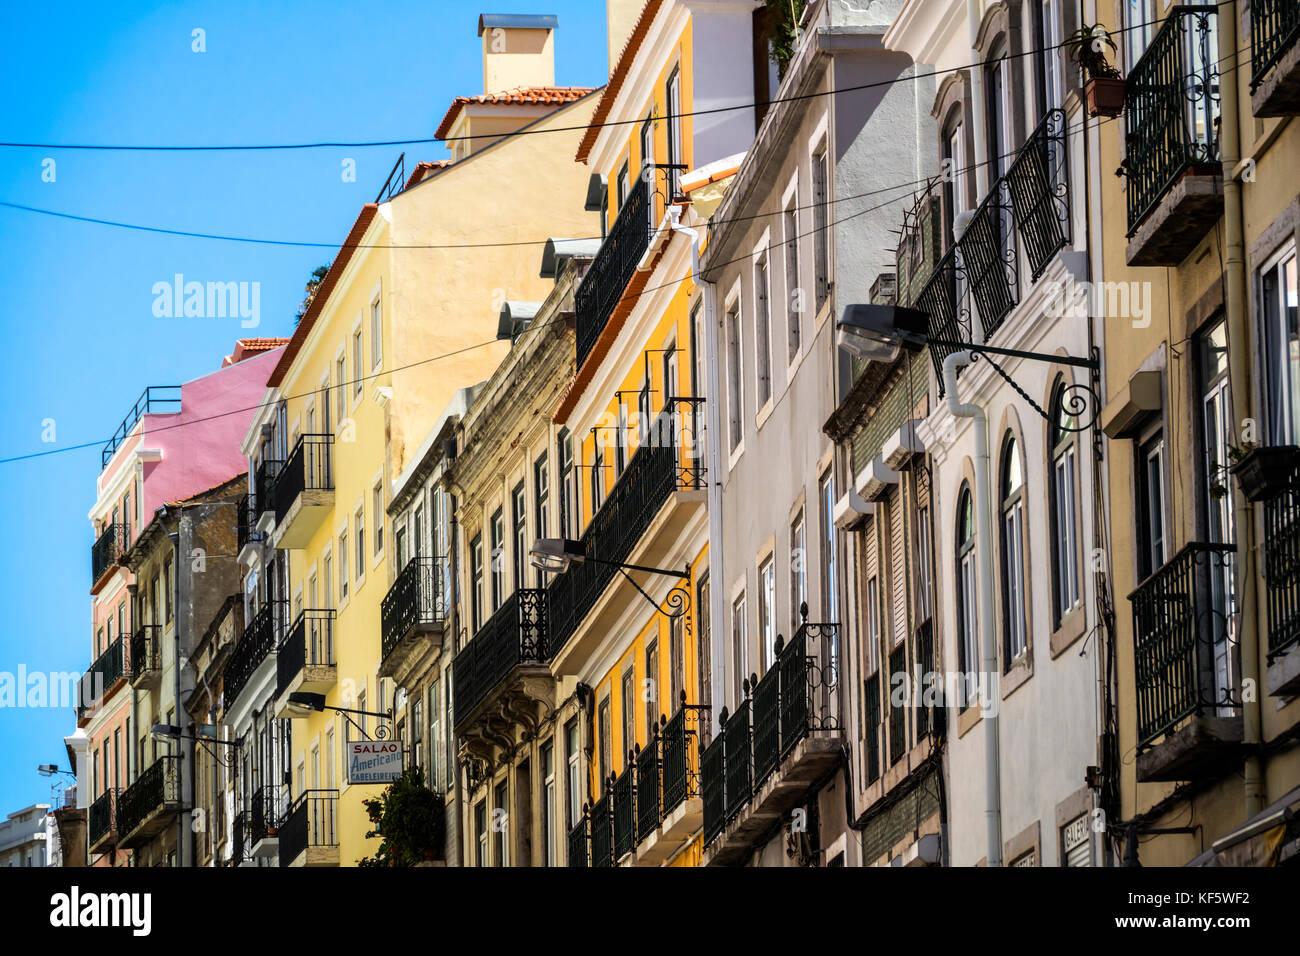 Lisbon Portugal Rato Rua De Sao Filipe Neri neighborhood residential apartment buildings balconies - Stock Image